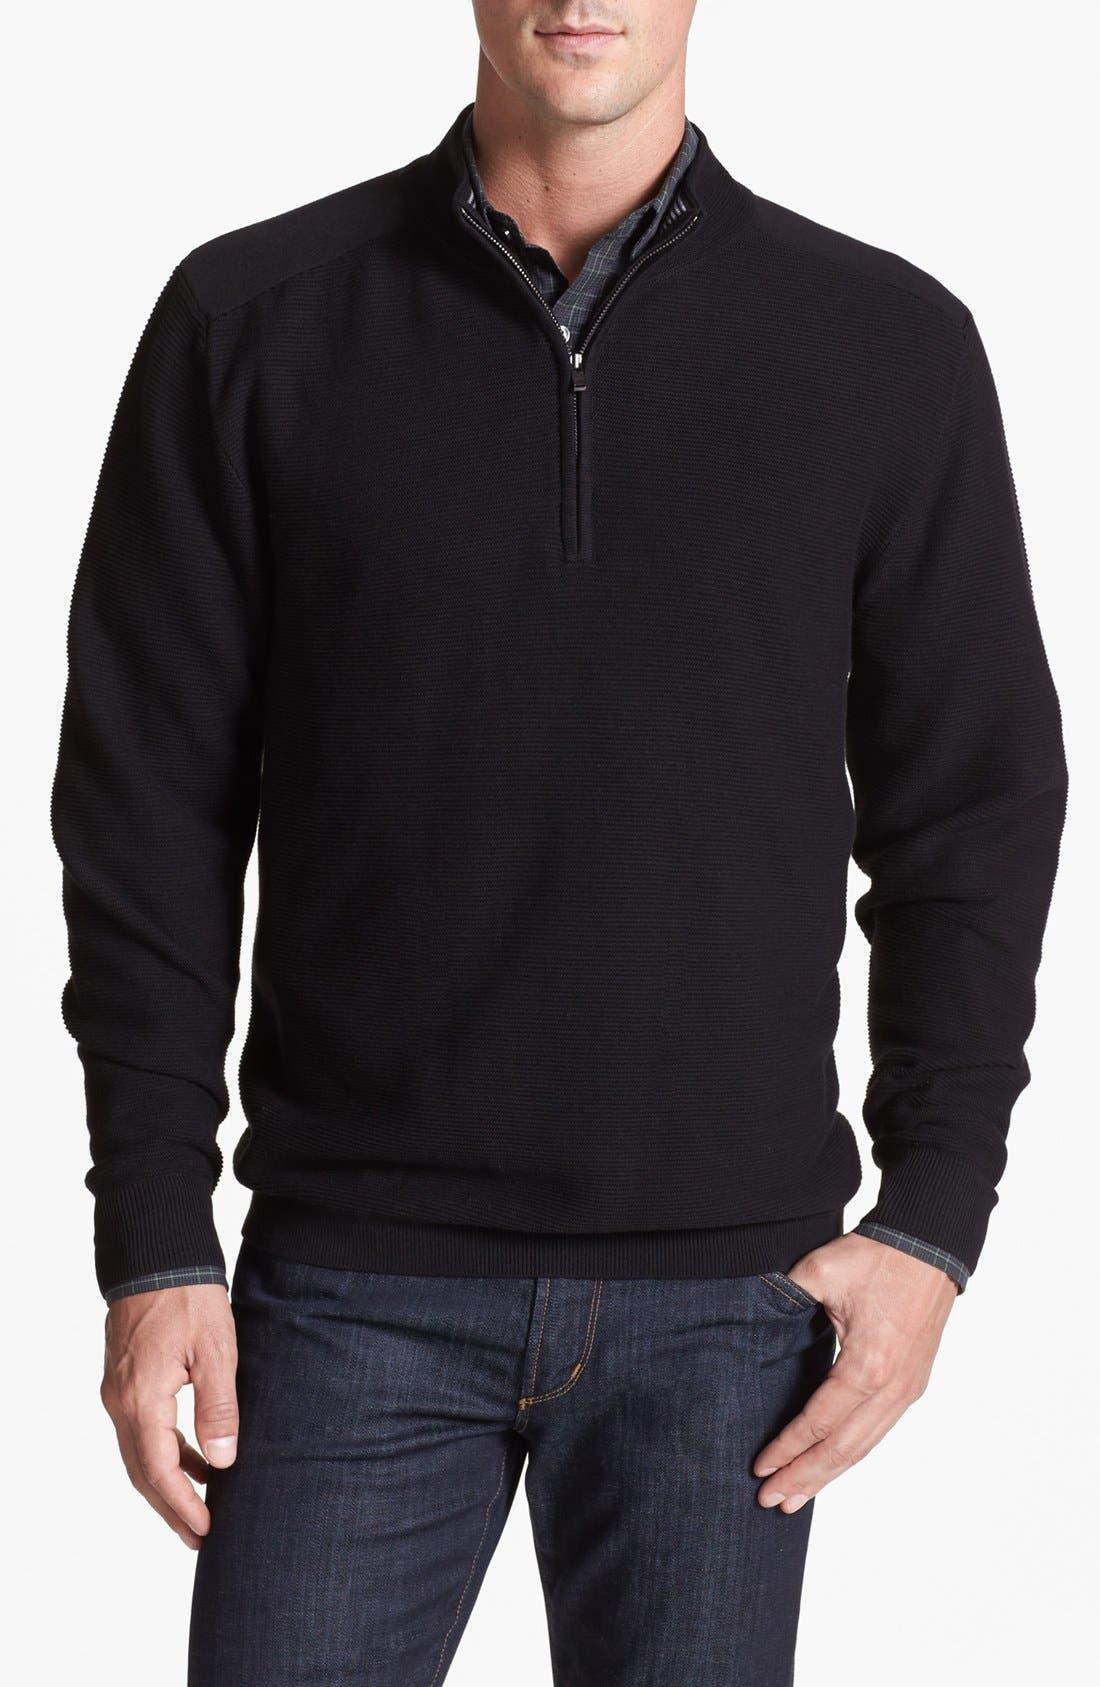 Main Image - Cutter & Buck 'Smith Cove' Half Zip Sweater